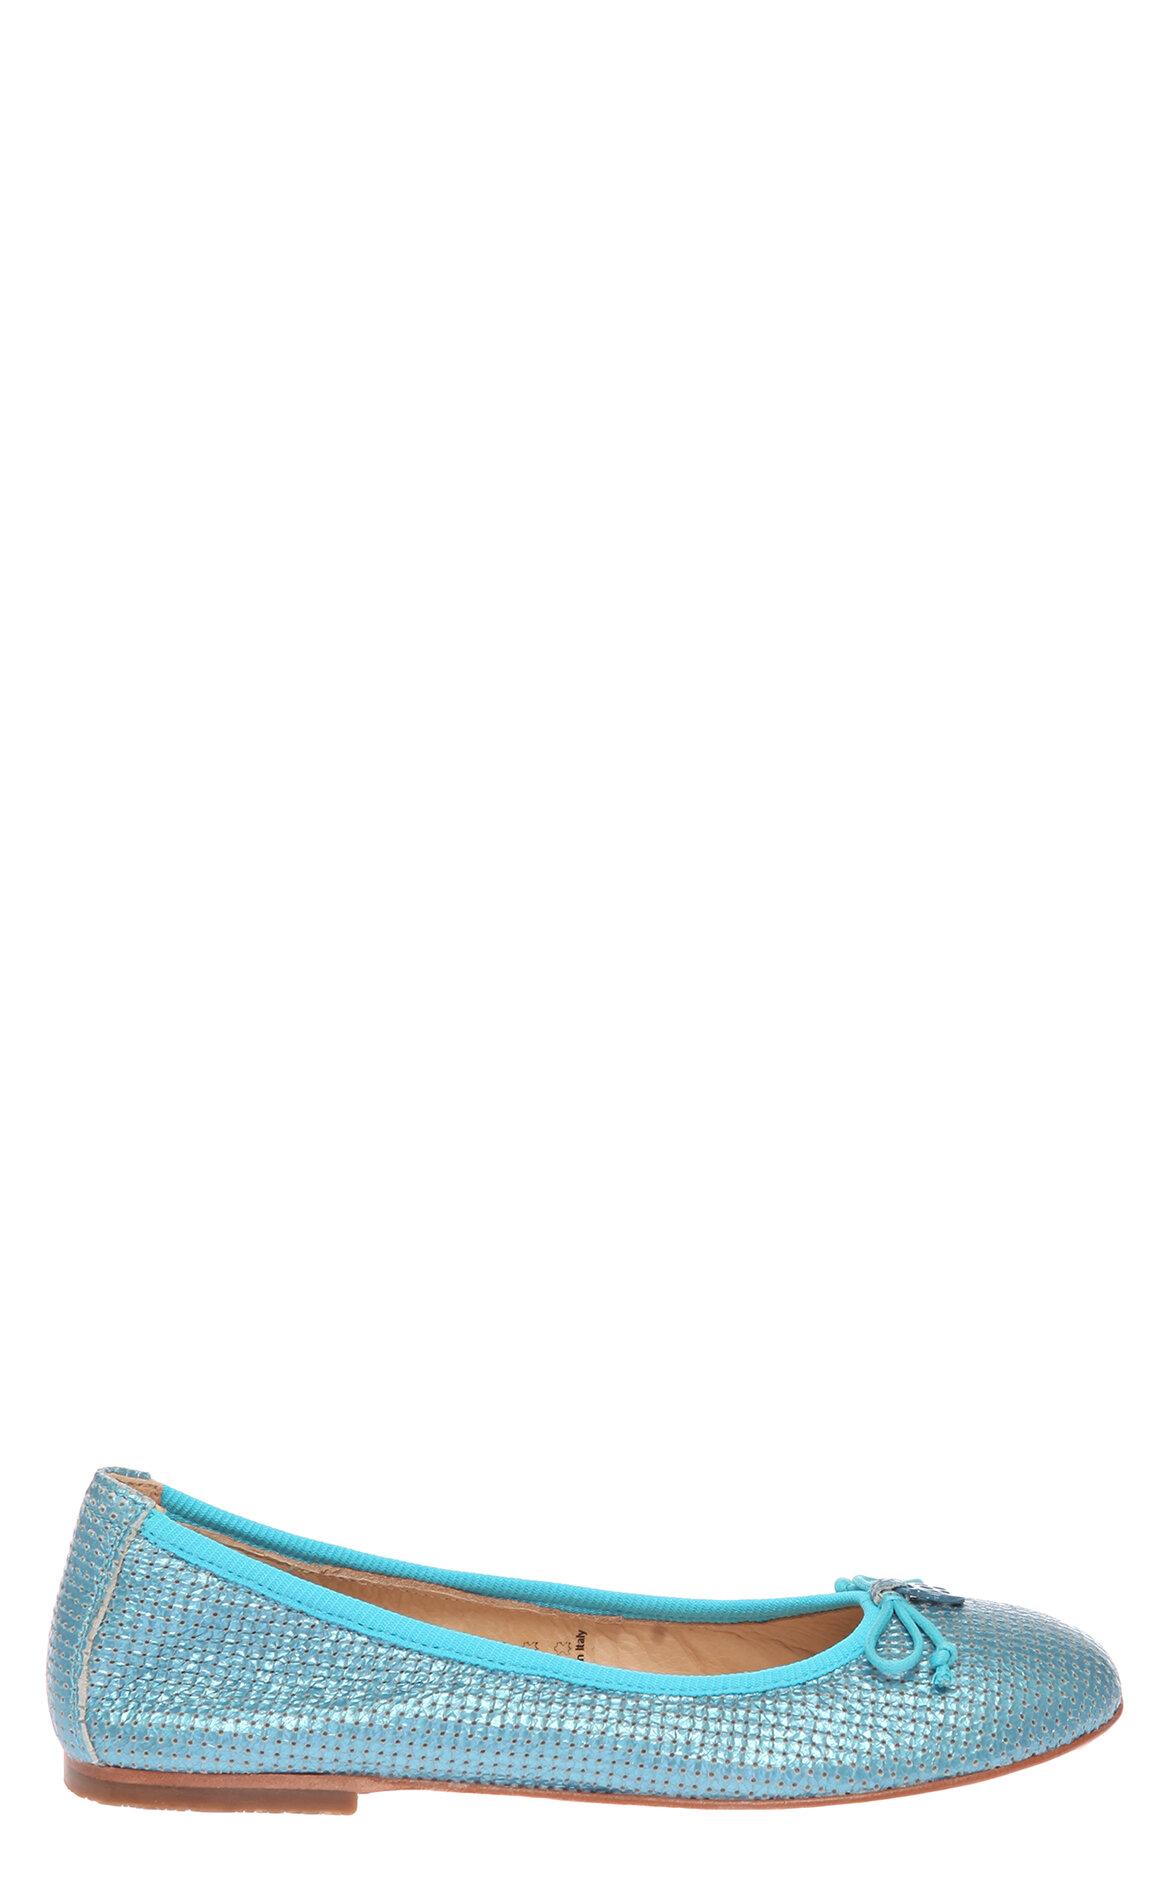 Florens-Florens Kız Çocuk Ayakkabı